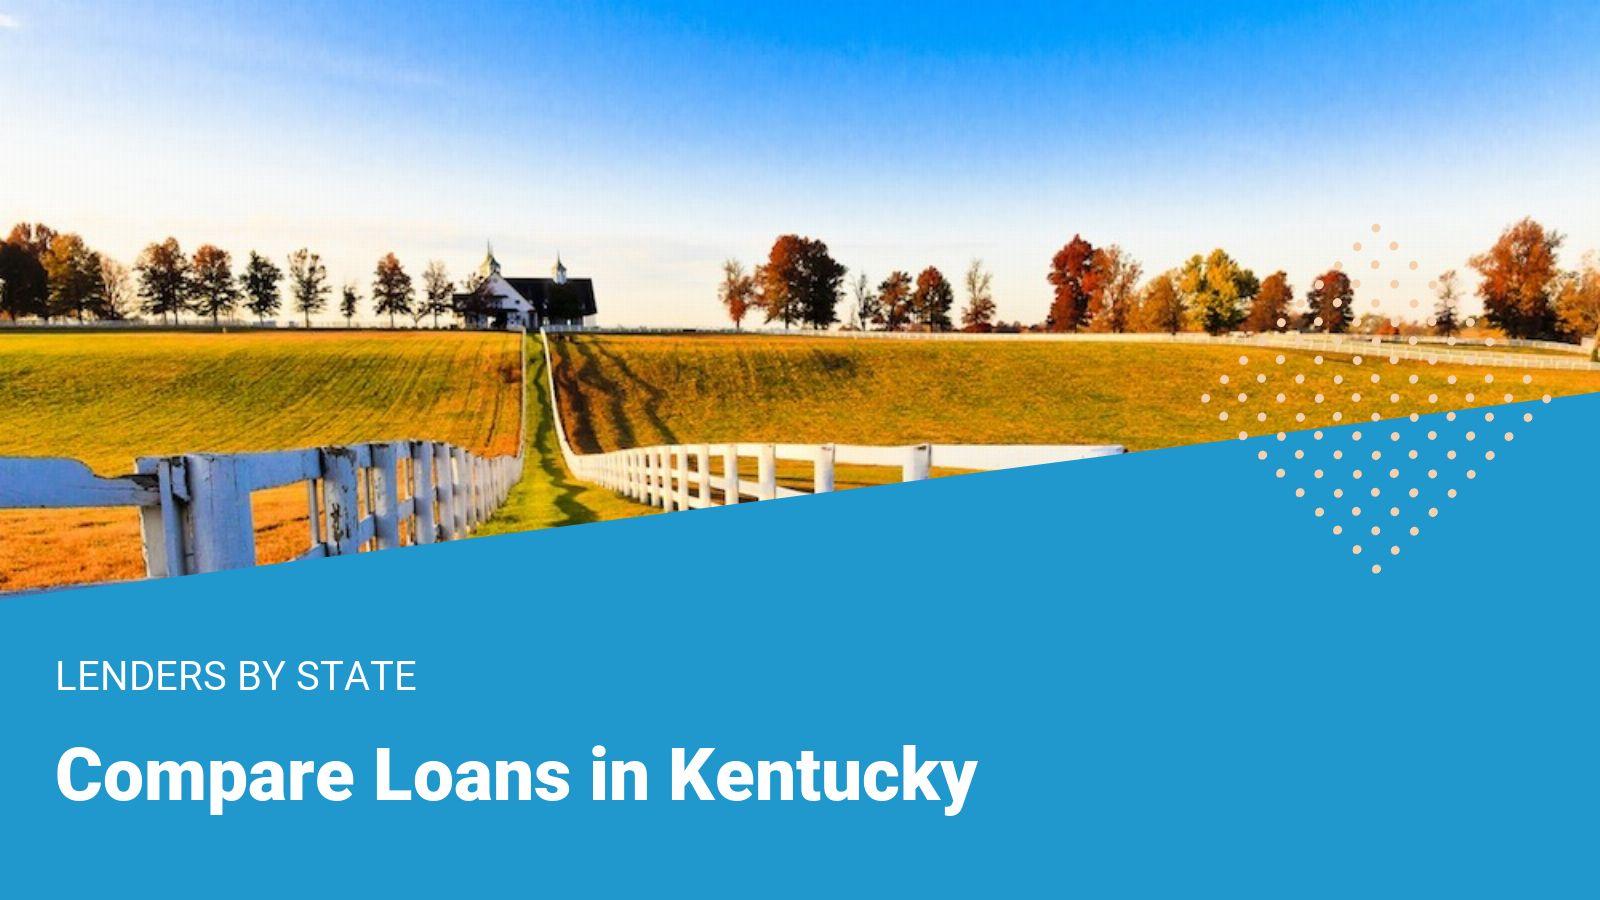 kentucky loans